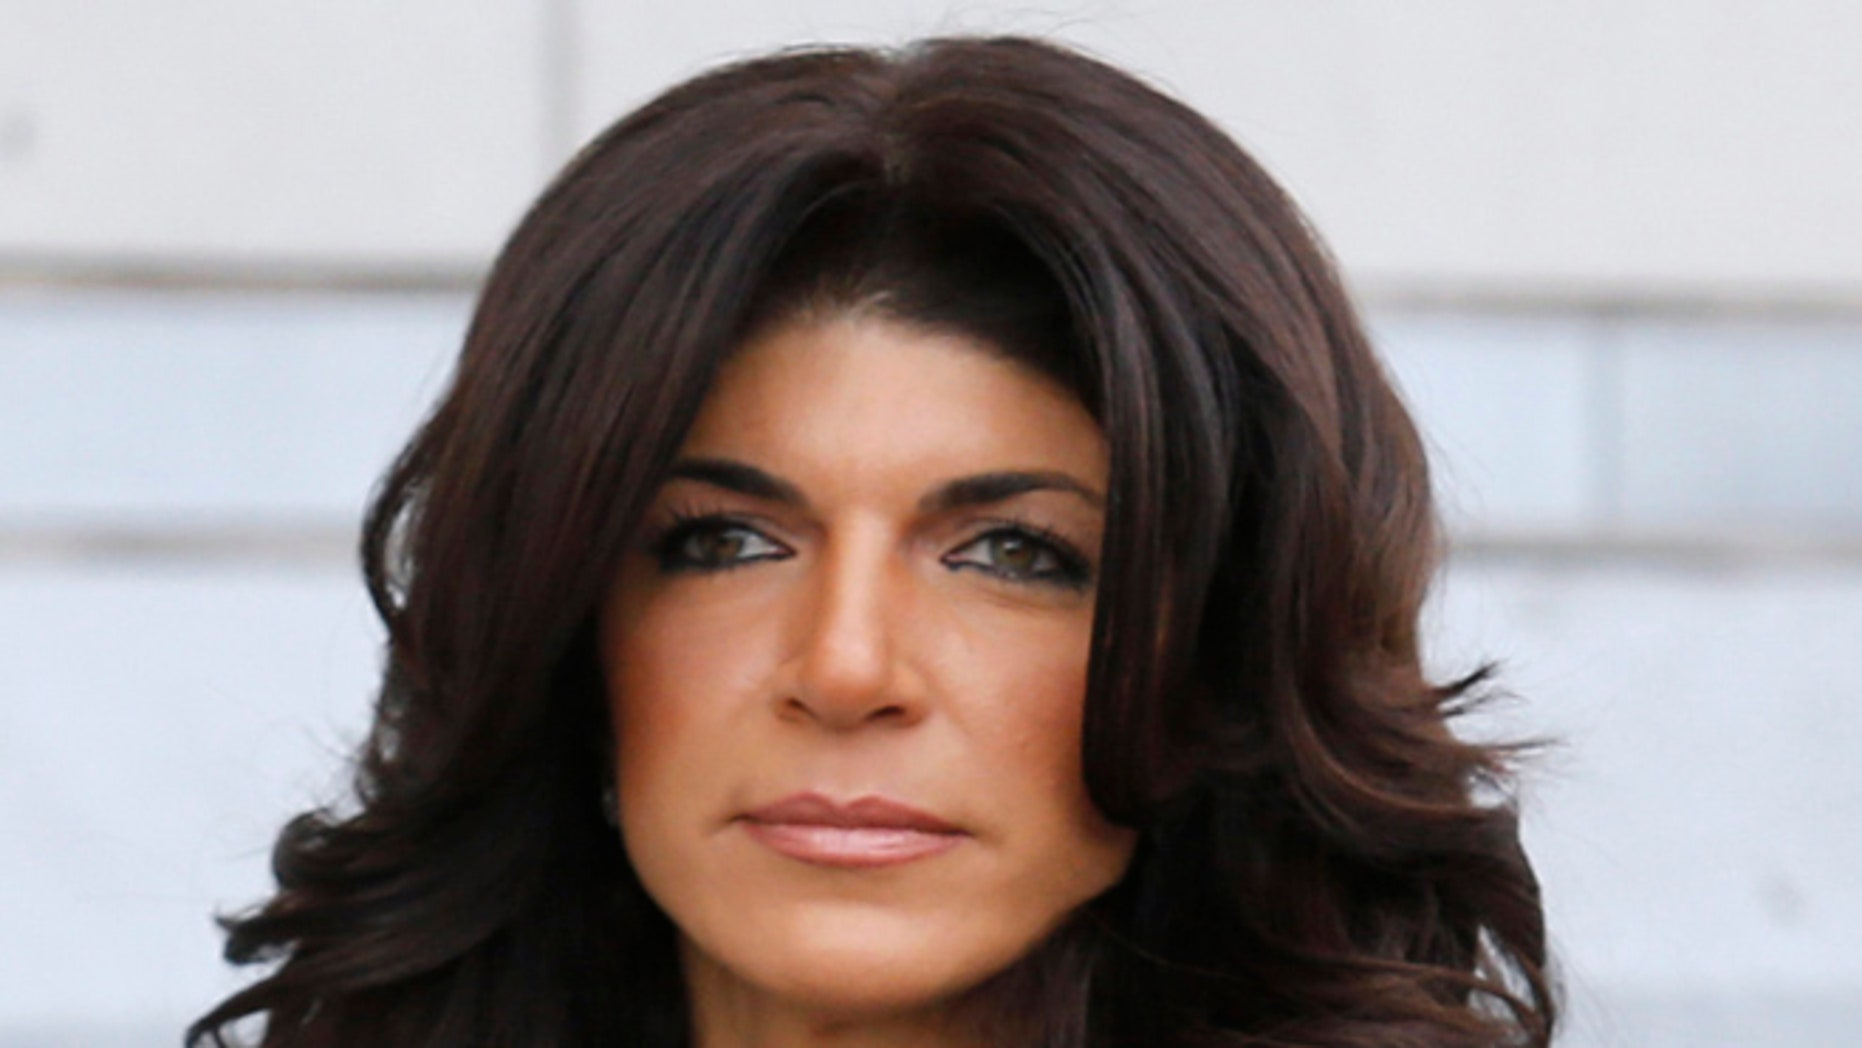 Teresa Giudice's mother has passed away at age 66.